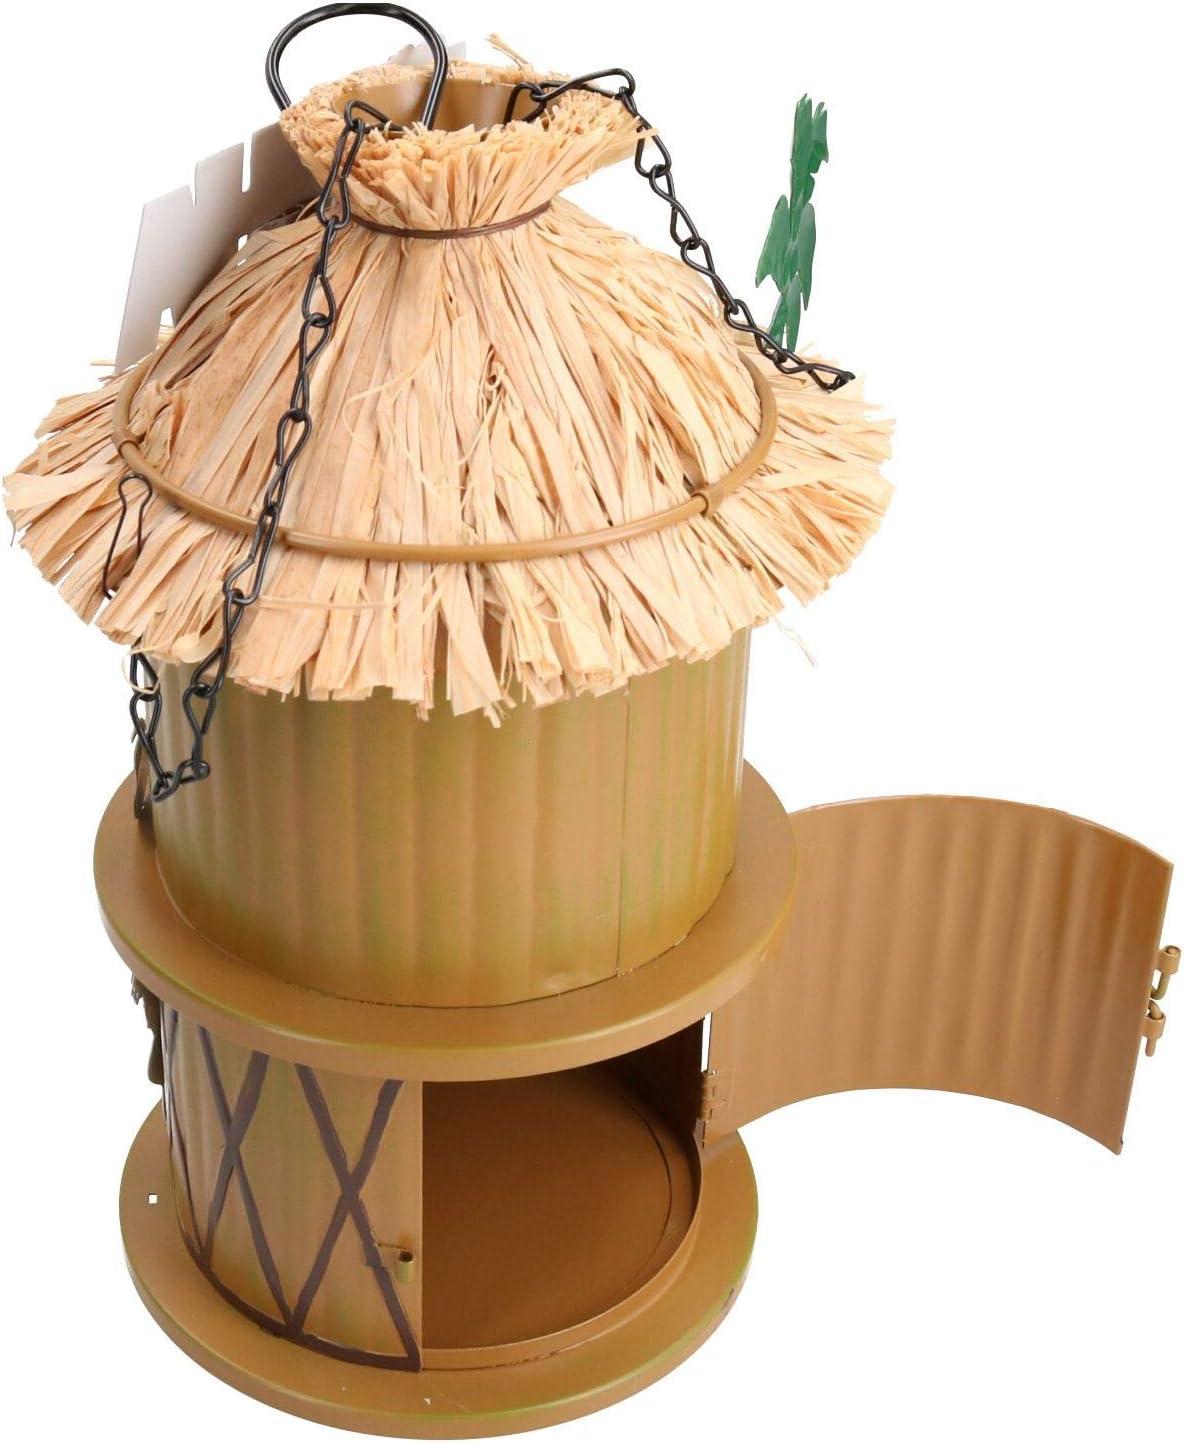 Funky Metal Tiki Bird House For Wild Birds  Garden Decor 14x25cm